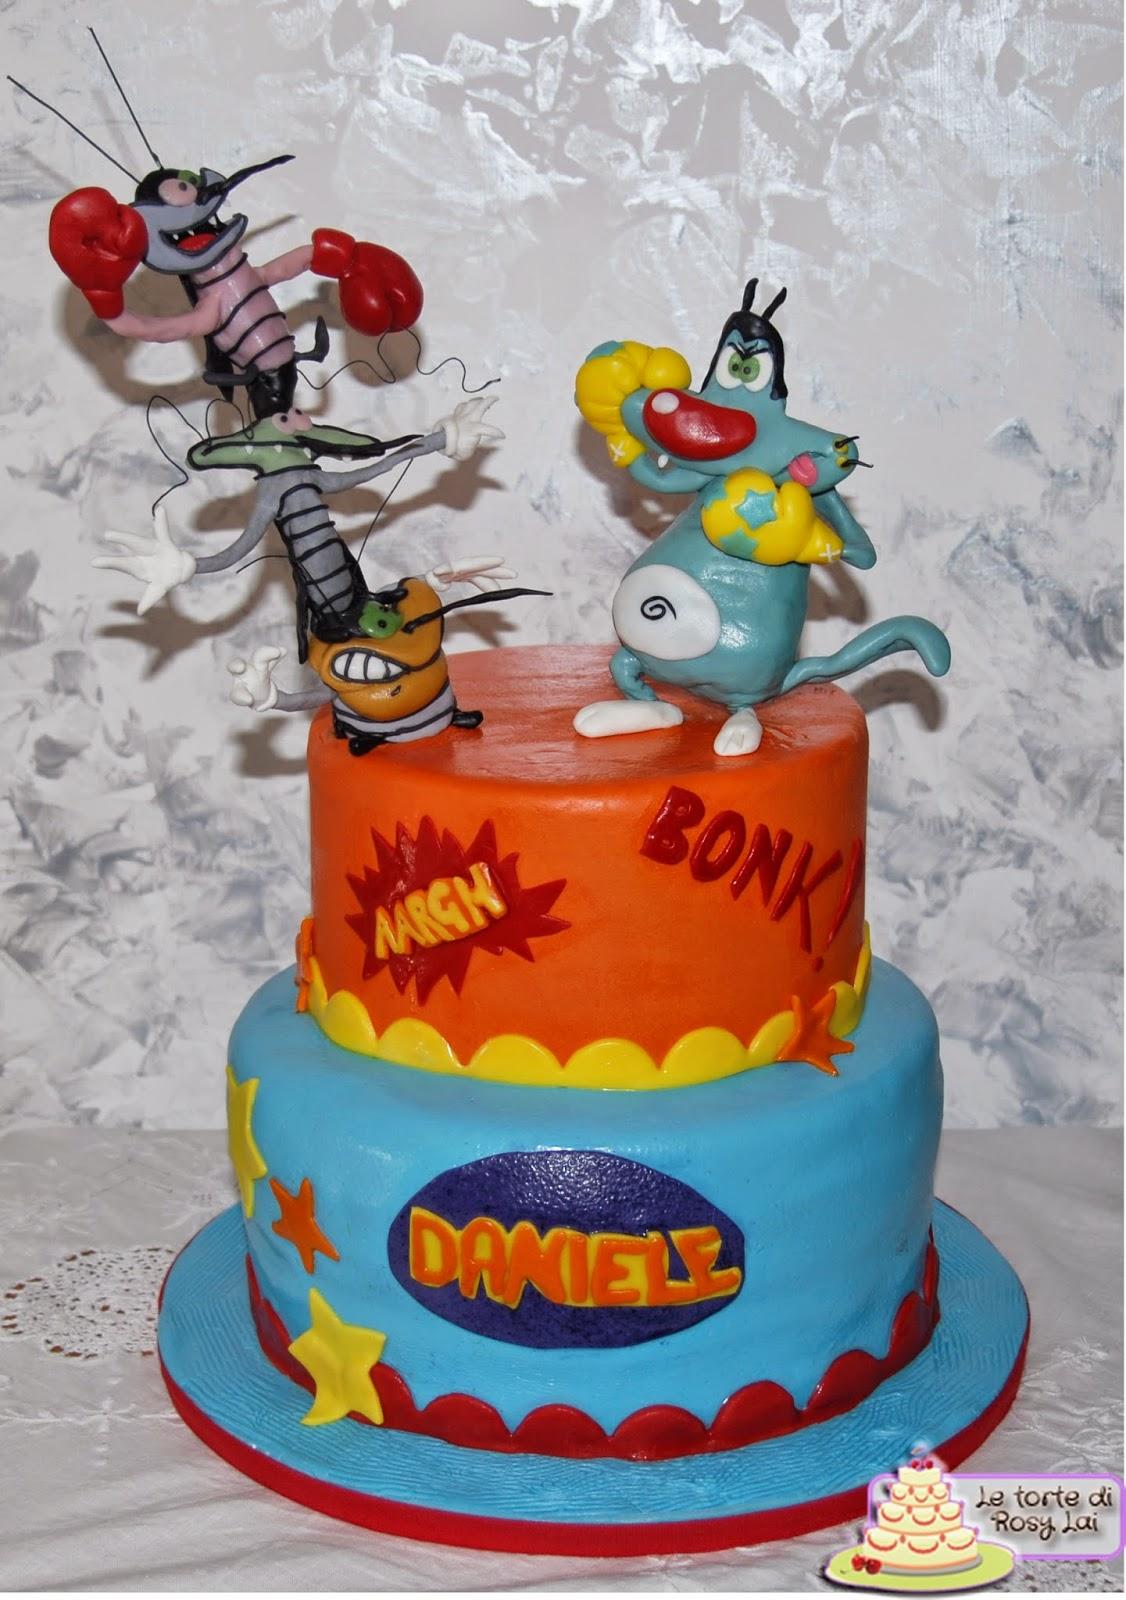 Torta Compleanno Oggy E I Maledetti Scarafaggi.Le Torte Di Rosy Lai Oggy E I Maledetti Scarafaggi